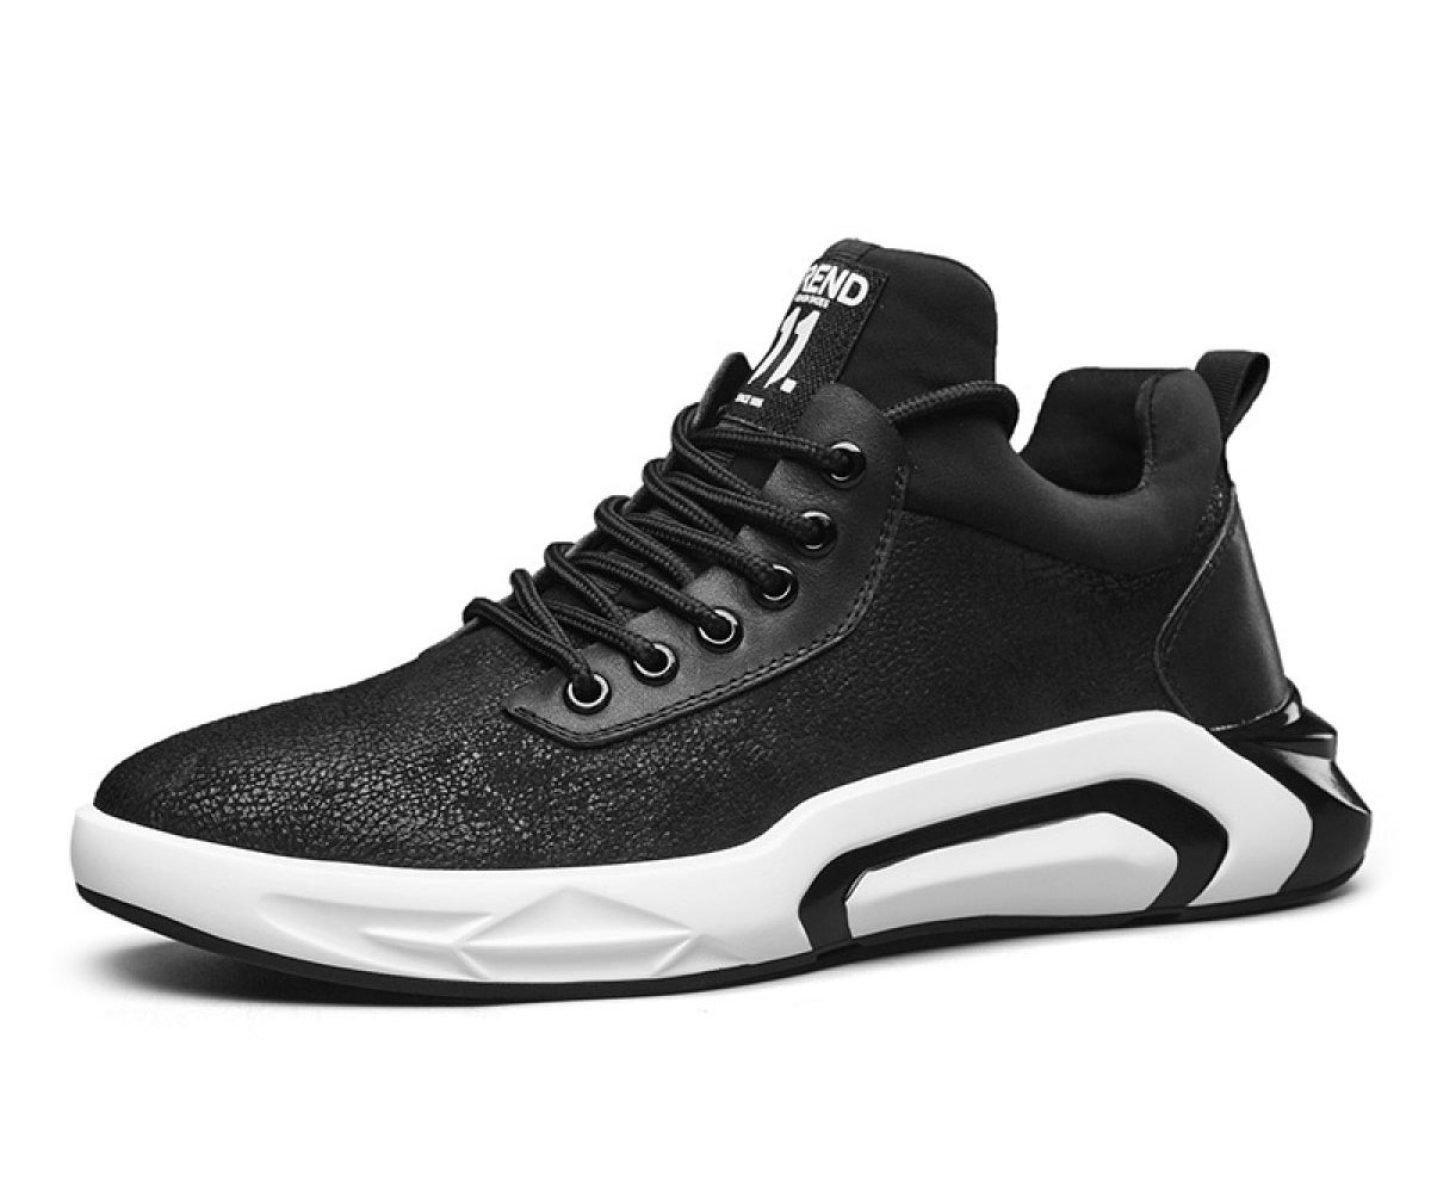 MUYII Zapatos De Cuero Oxfords Para Hombre Zapatos De Punta Llana Zapatos Deportivos De Deporte Casual Para Hombre Zapatos Antideslizantes,Black-EU41 EU41 Black